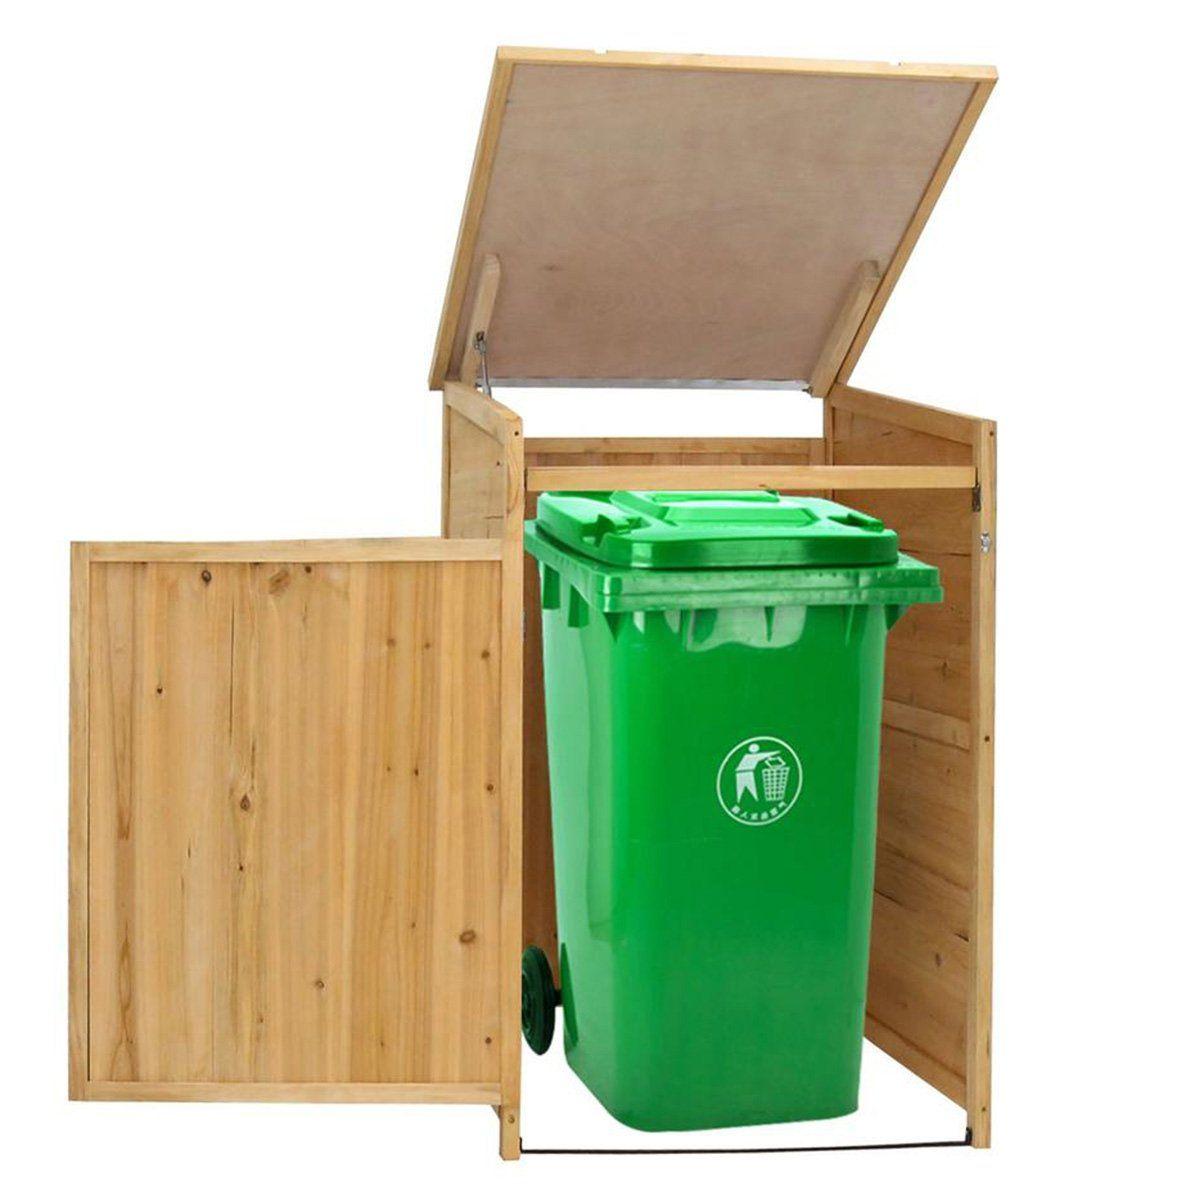 9 Ways To Disguise Your Trash Bin Garbage Storage Outdoor Garbage Storage Trash Bins